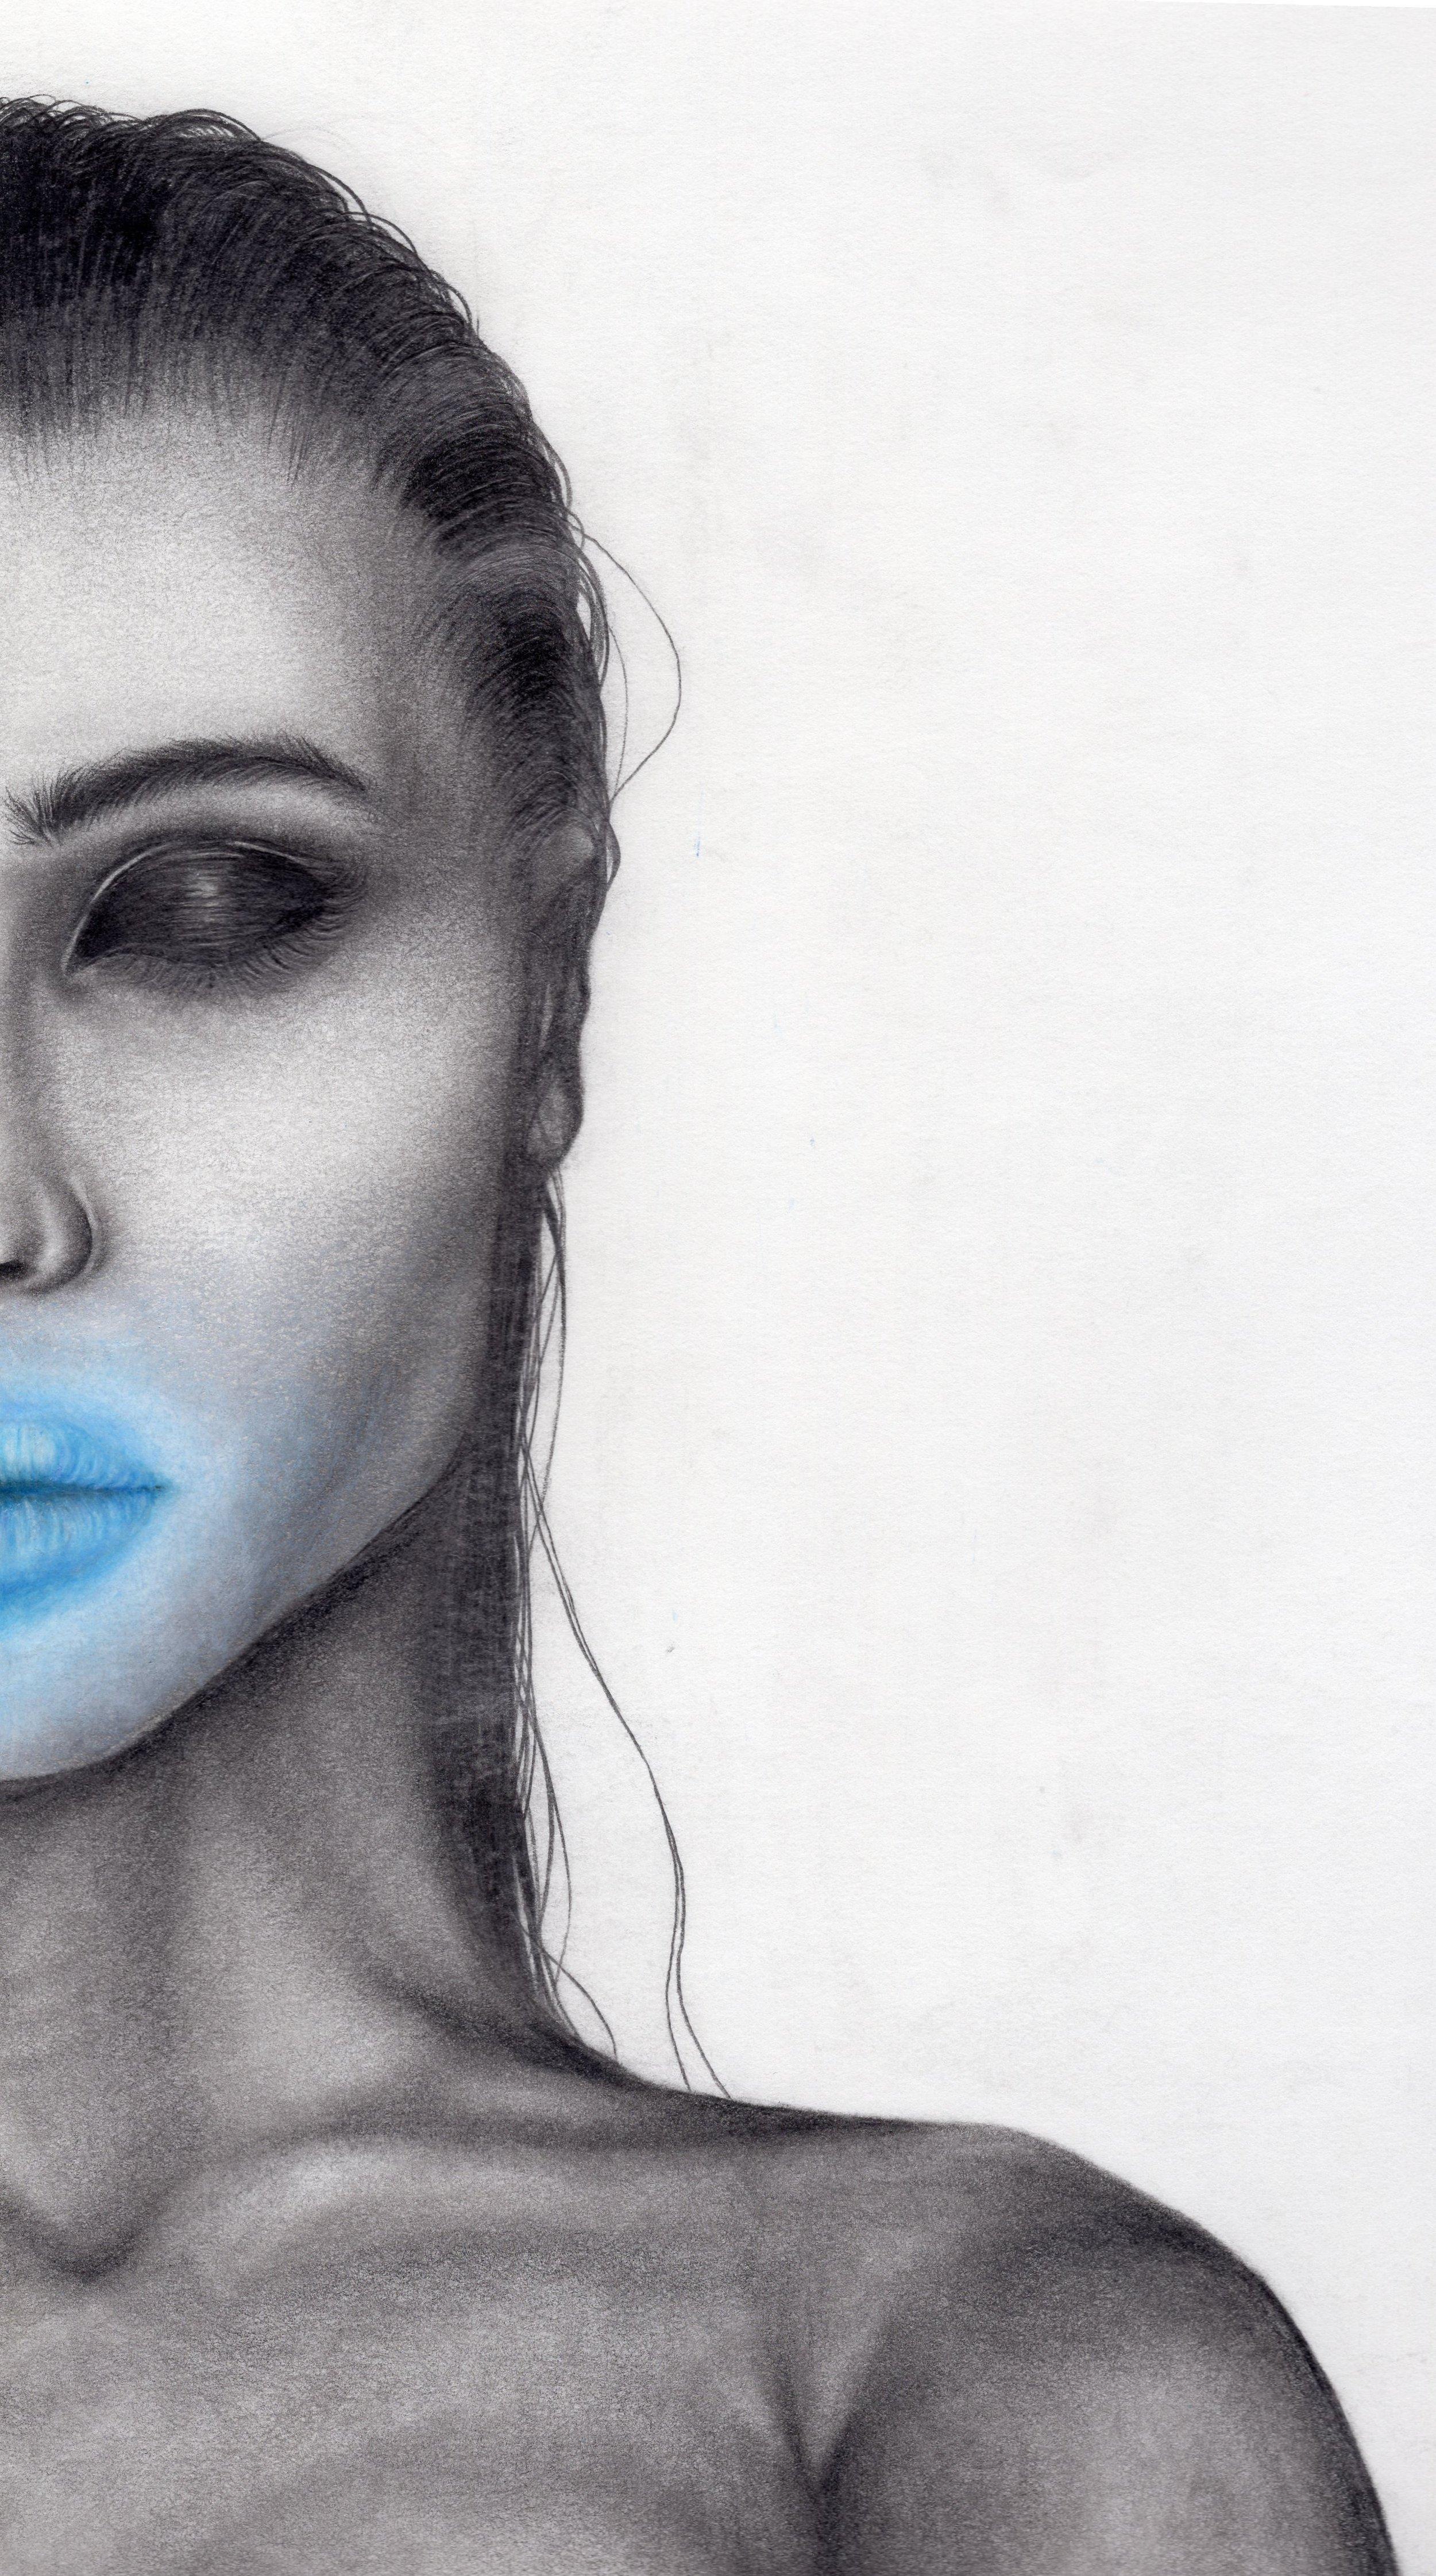 Illustration by Tayden Seay